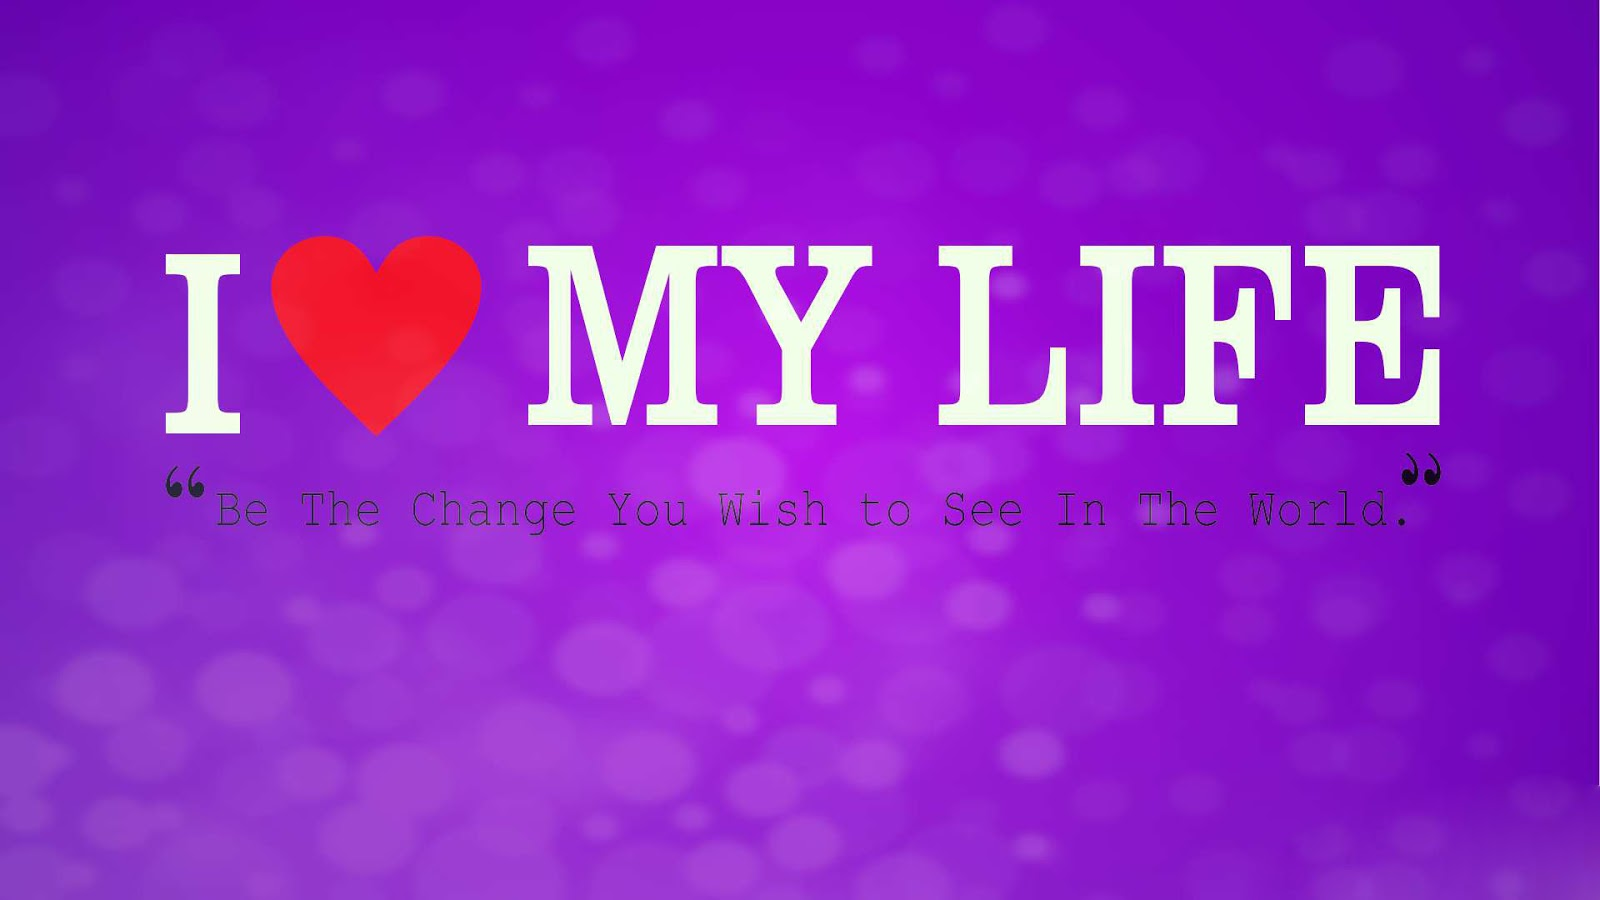 I-Love-My-Life-Quotes-Free-HD-Wallpaper.jpg